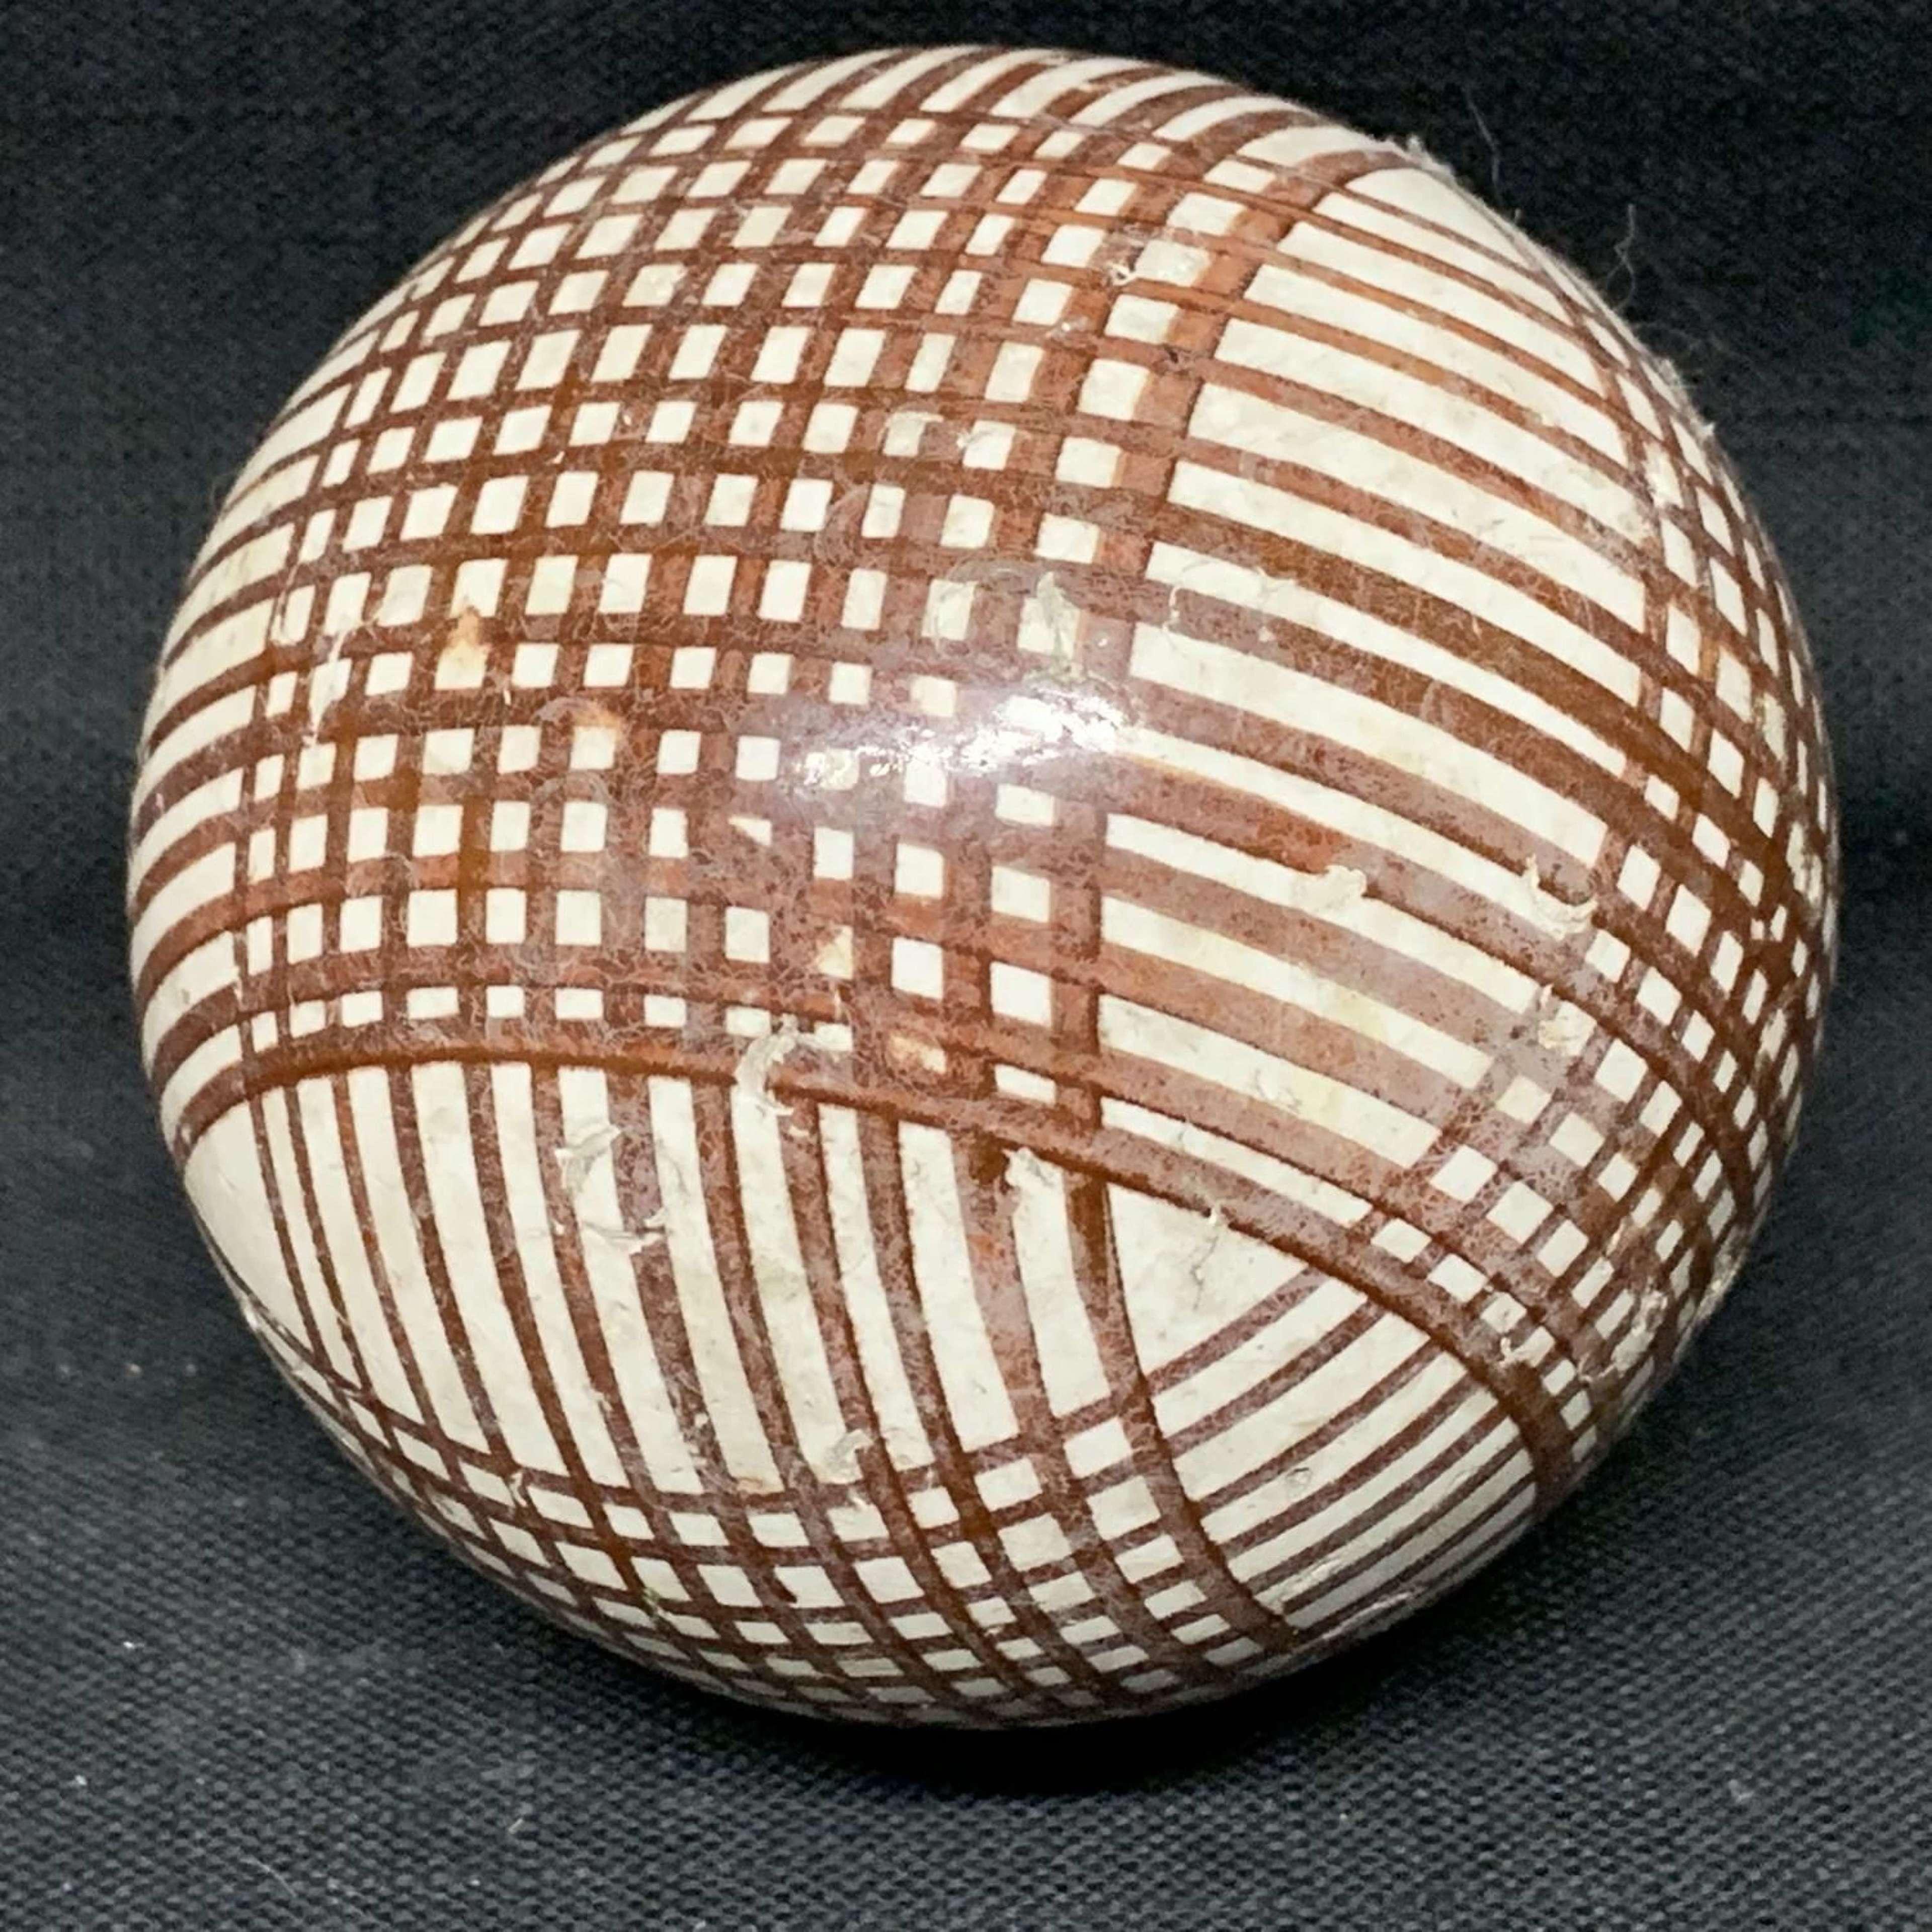 Victorian Ceramic Brown Striped Scottish Carpet Ball 1860